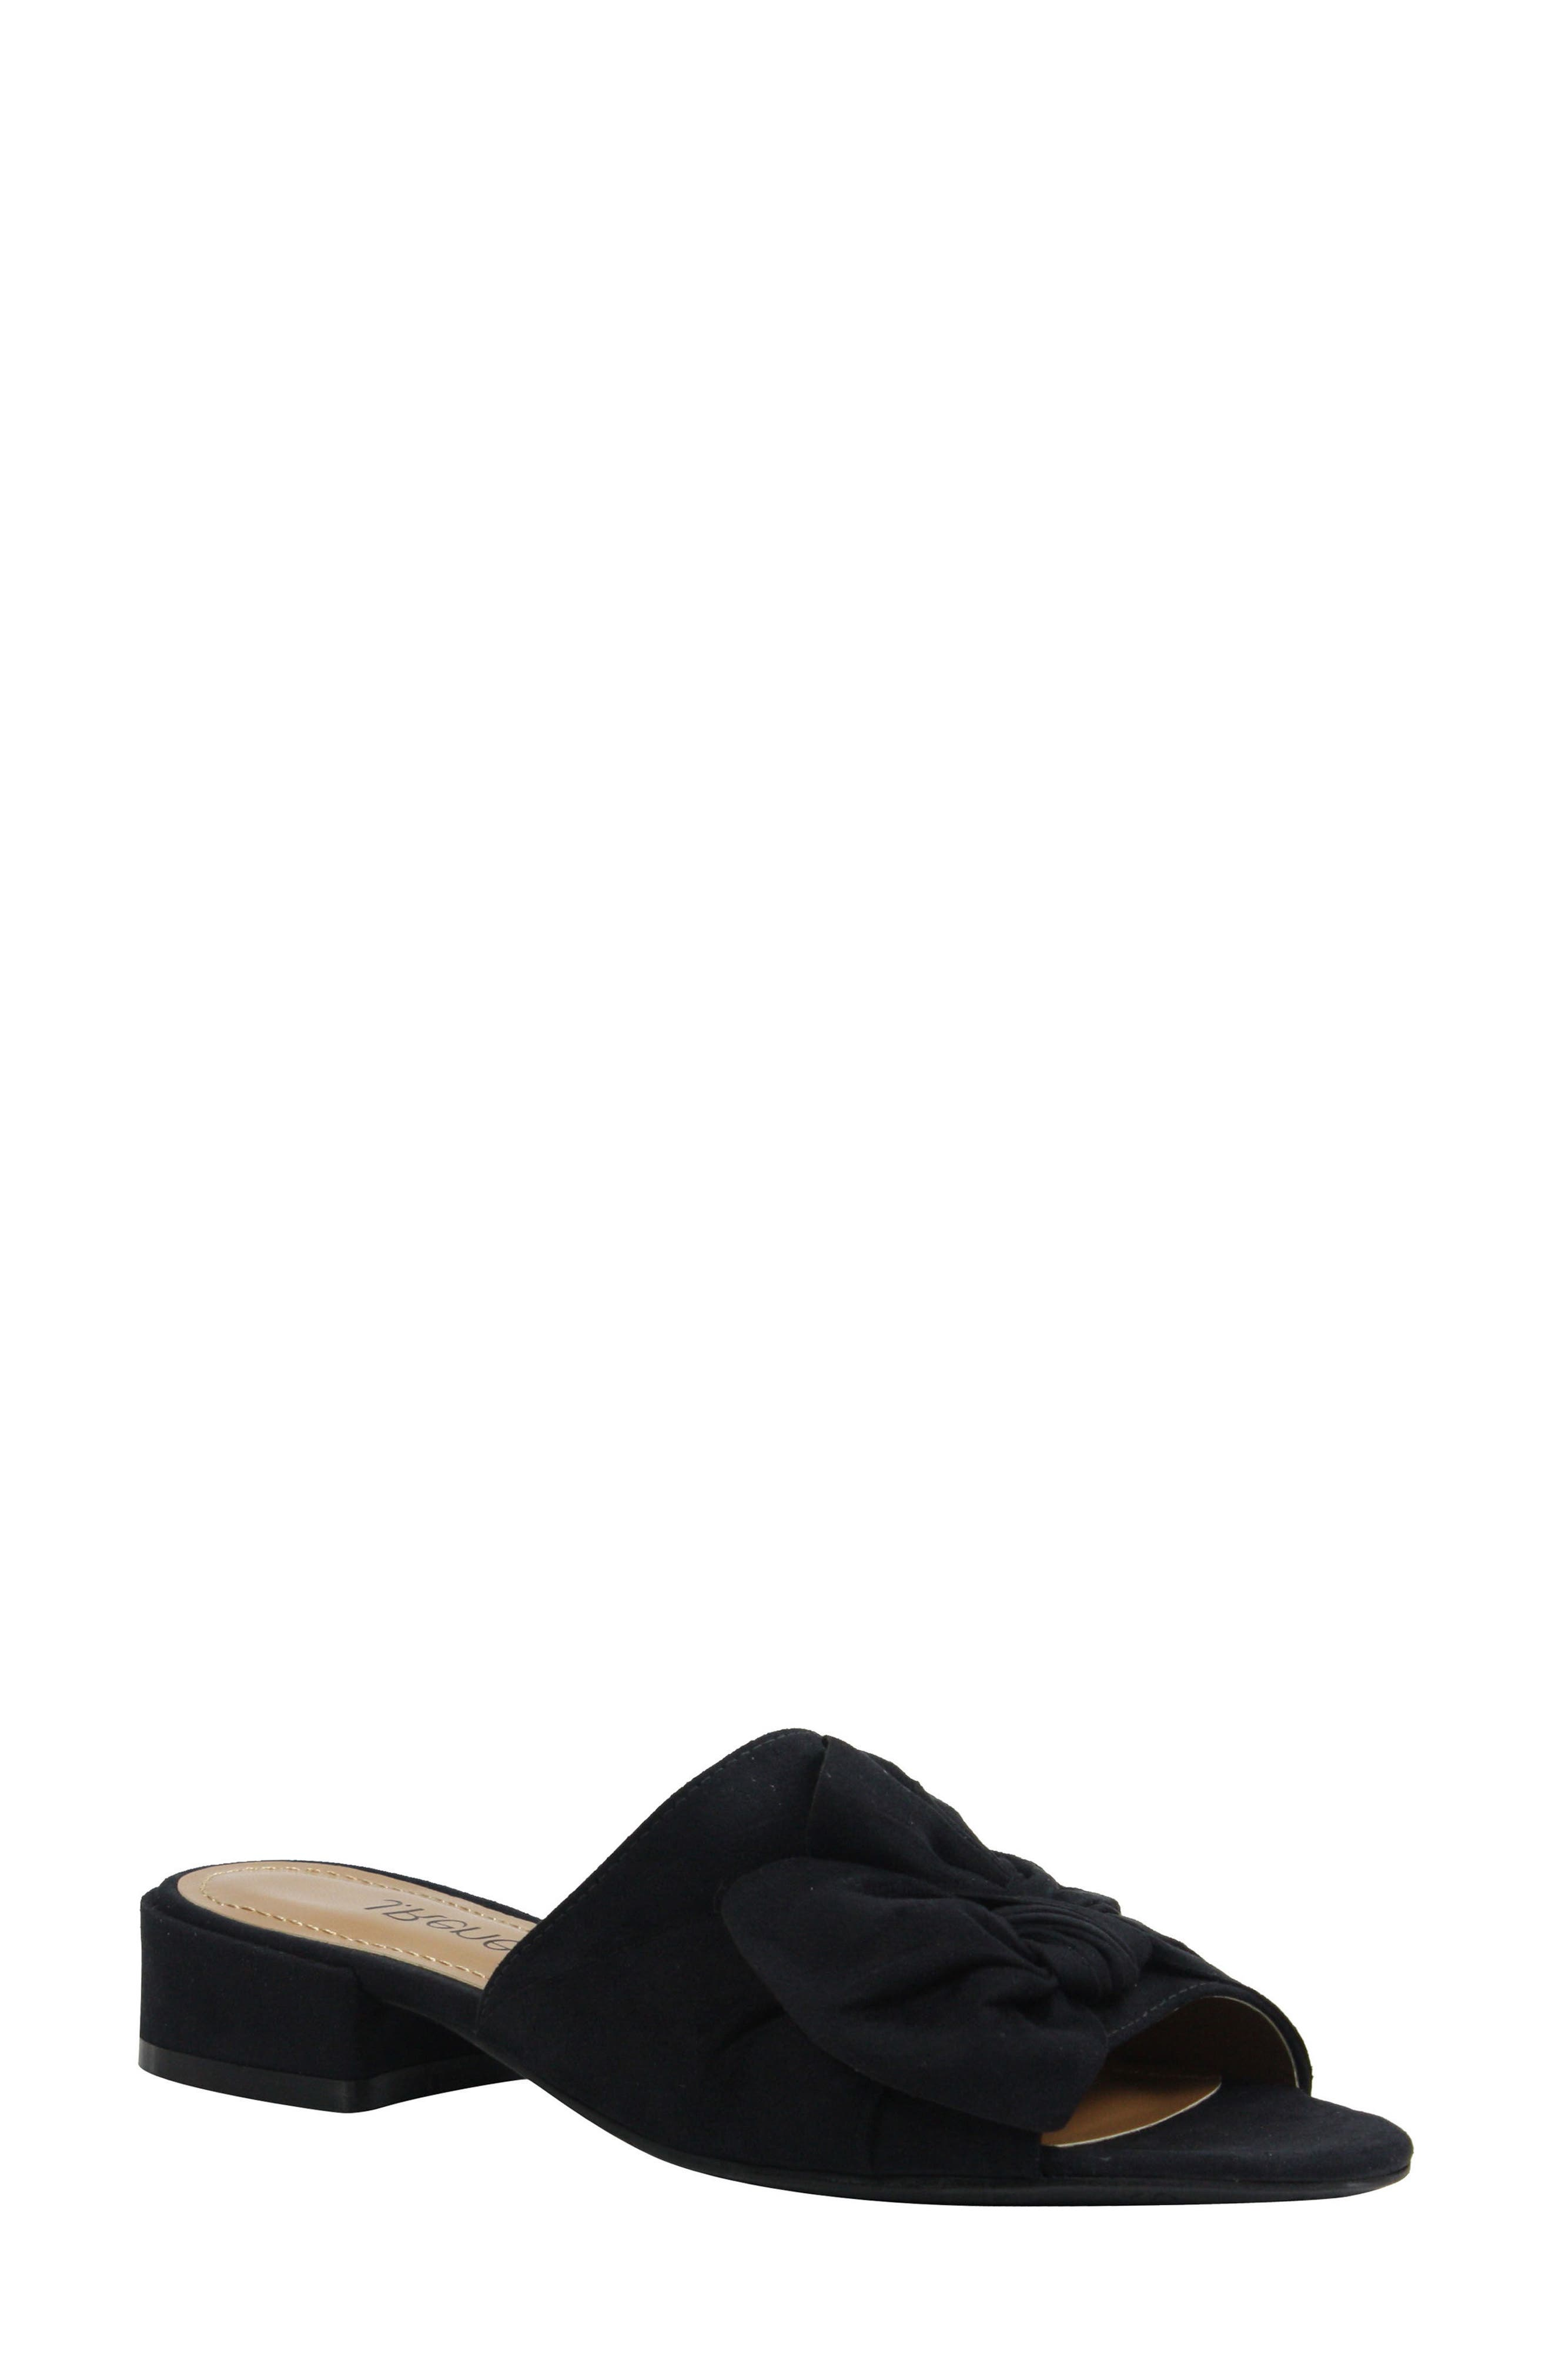 Sattuck Slide Sandal,                             Main thumbnail 1, color,                             BLACK FABRIC